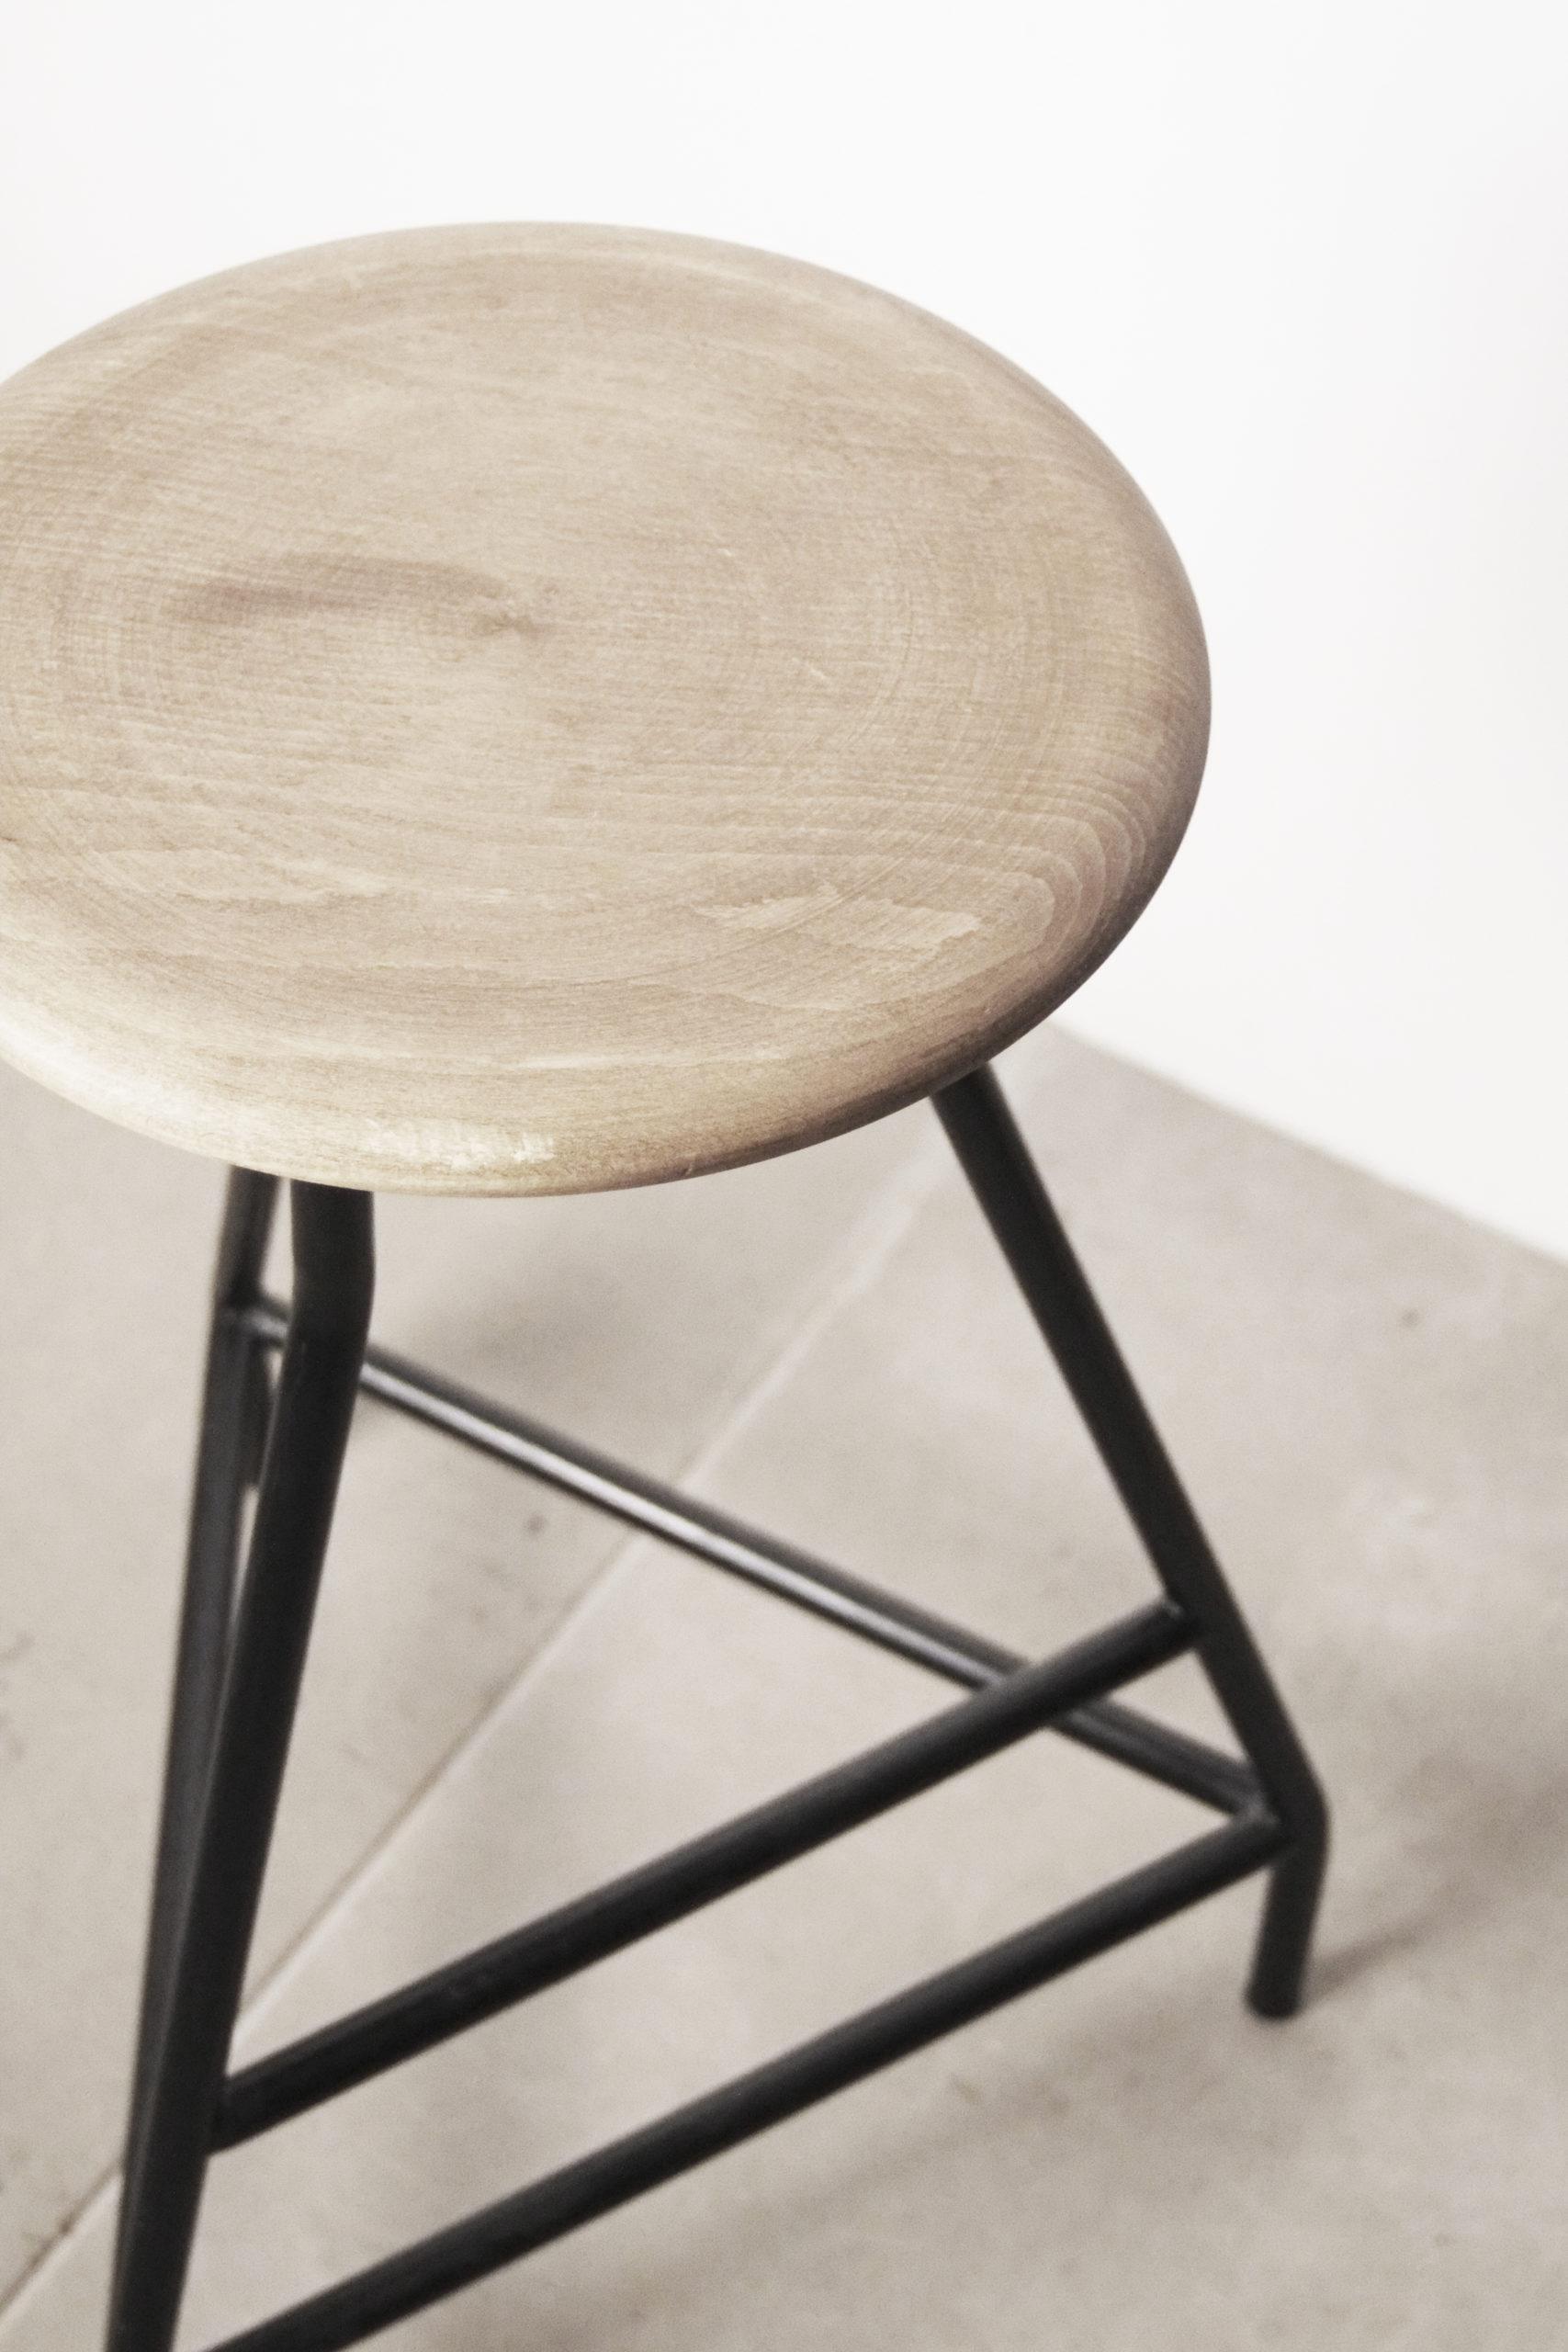 taburete de madera torneada redondeado hecho a mano